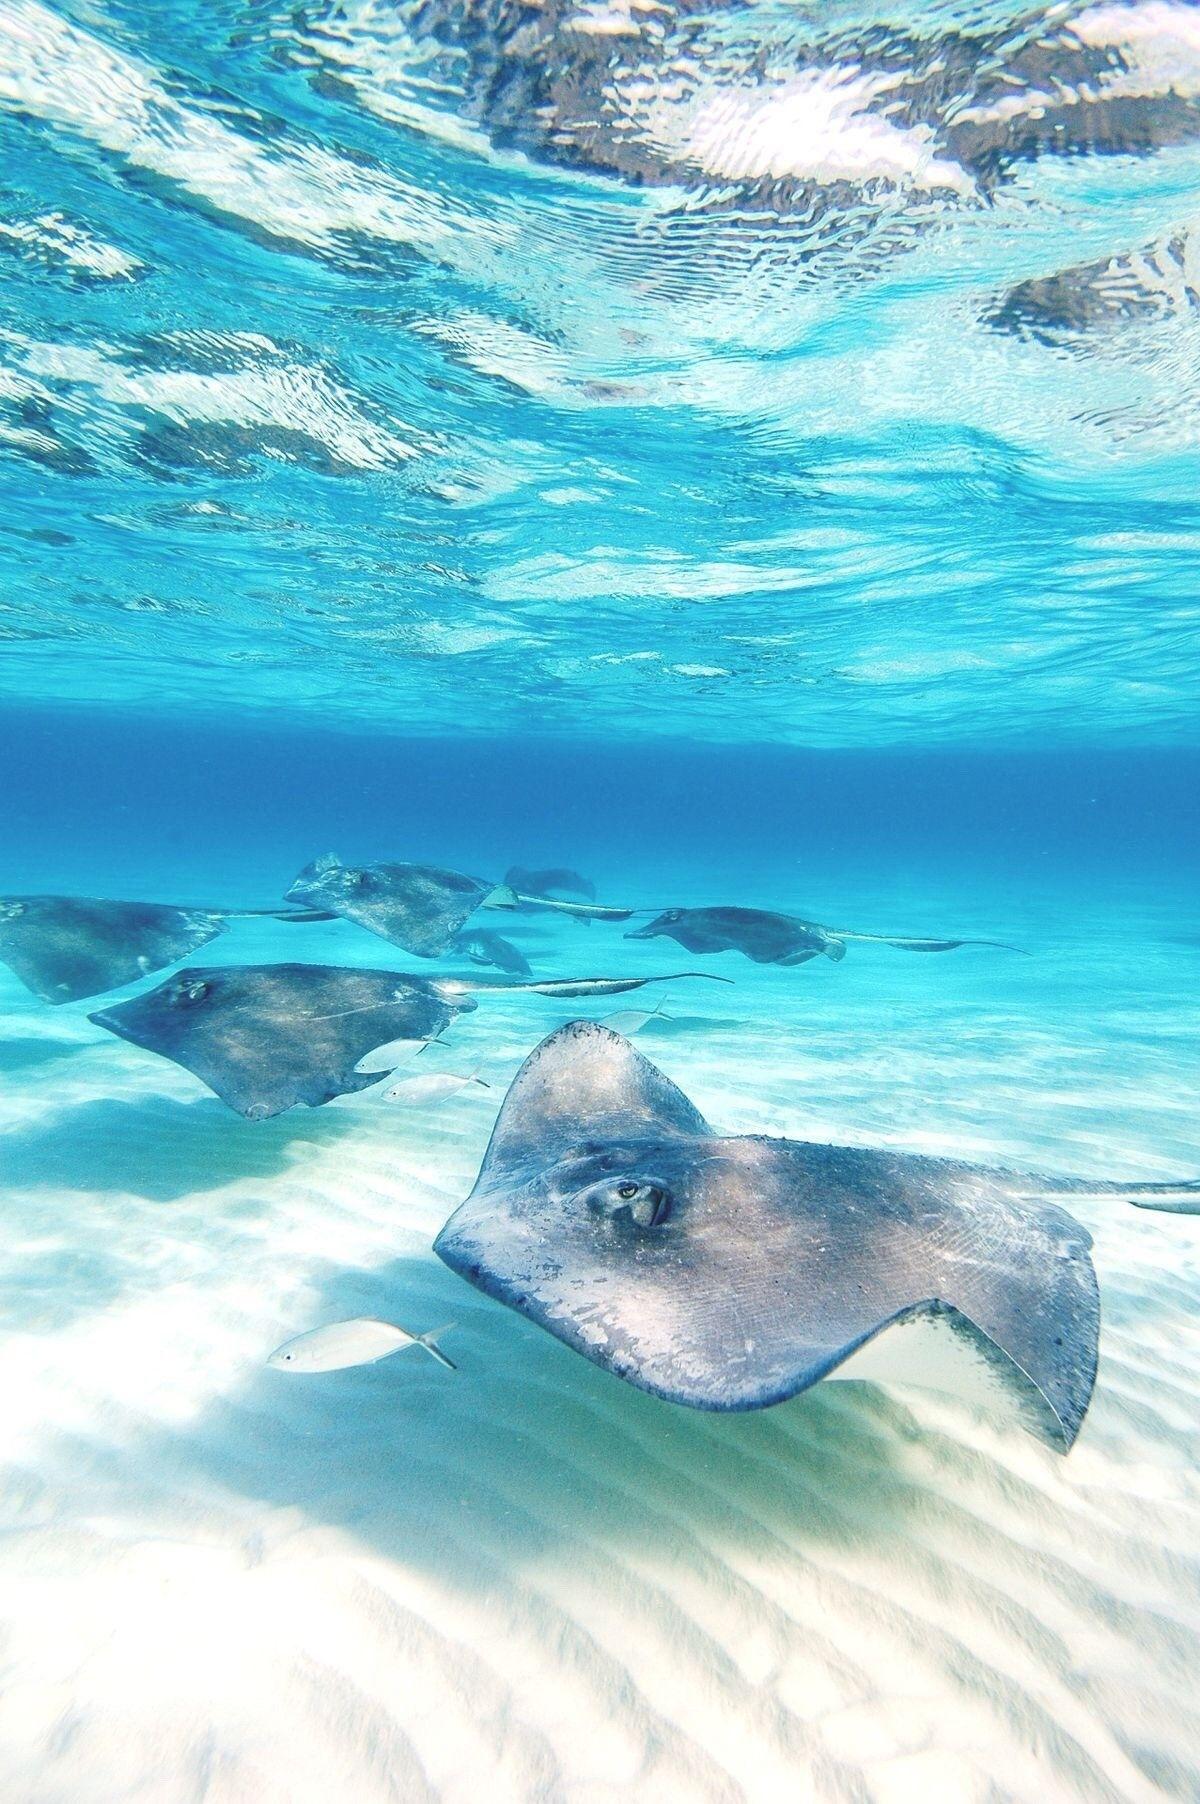 Pin De Brenda B En Ocean Animáles De Océano Animales Marinos Mundo Marino